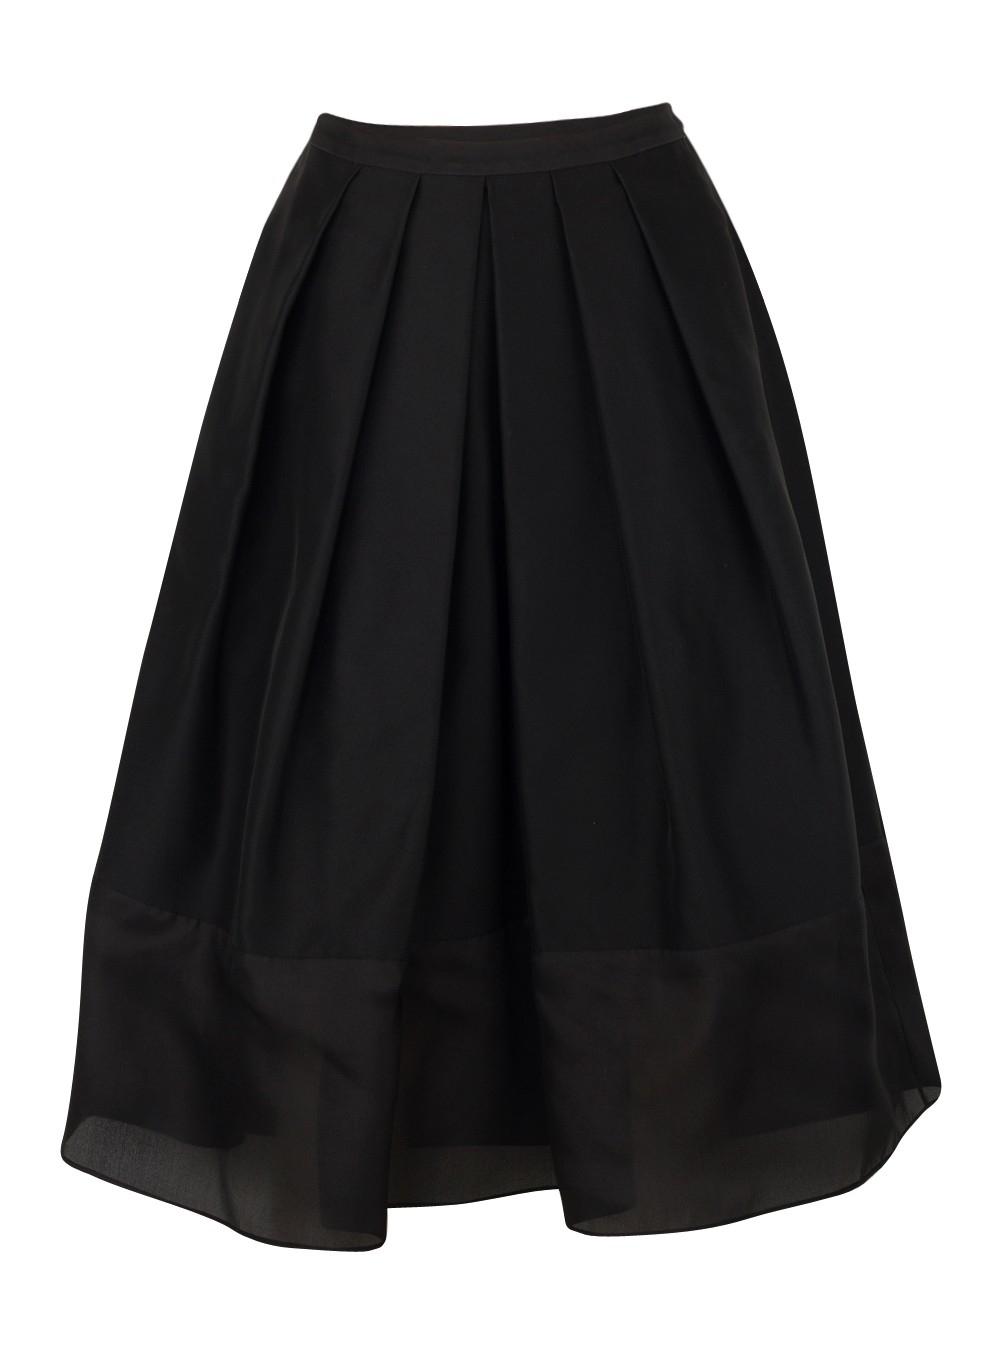 tibi techno faille pleated skirt in black lyst